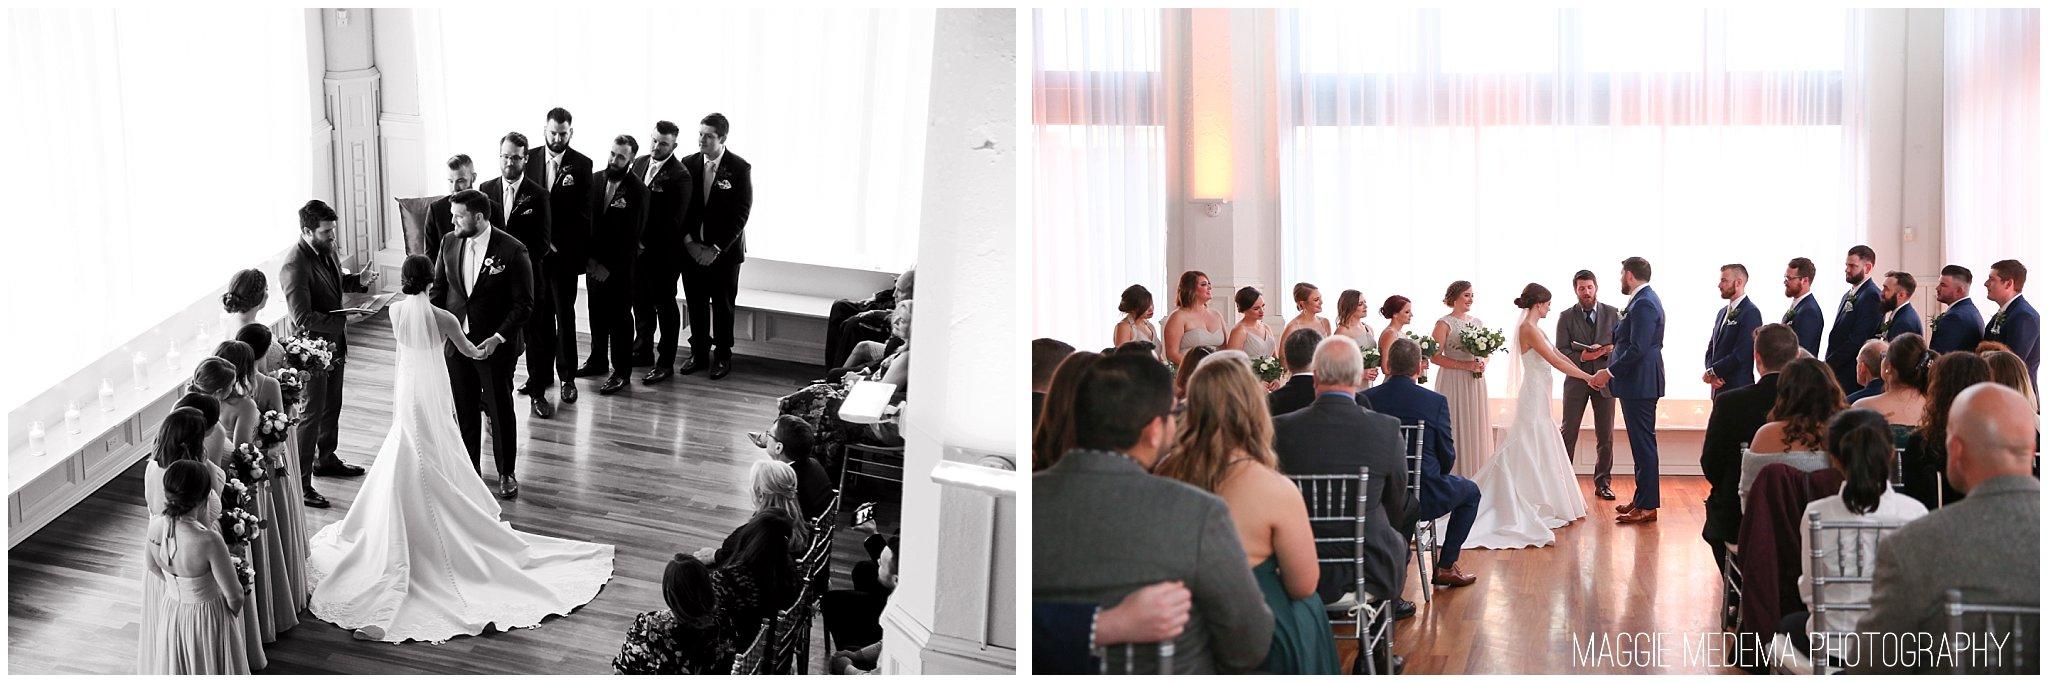 St. Louis Wedding Photography, Lumen St. Louis